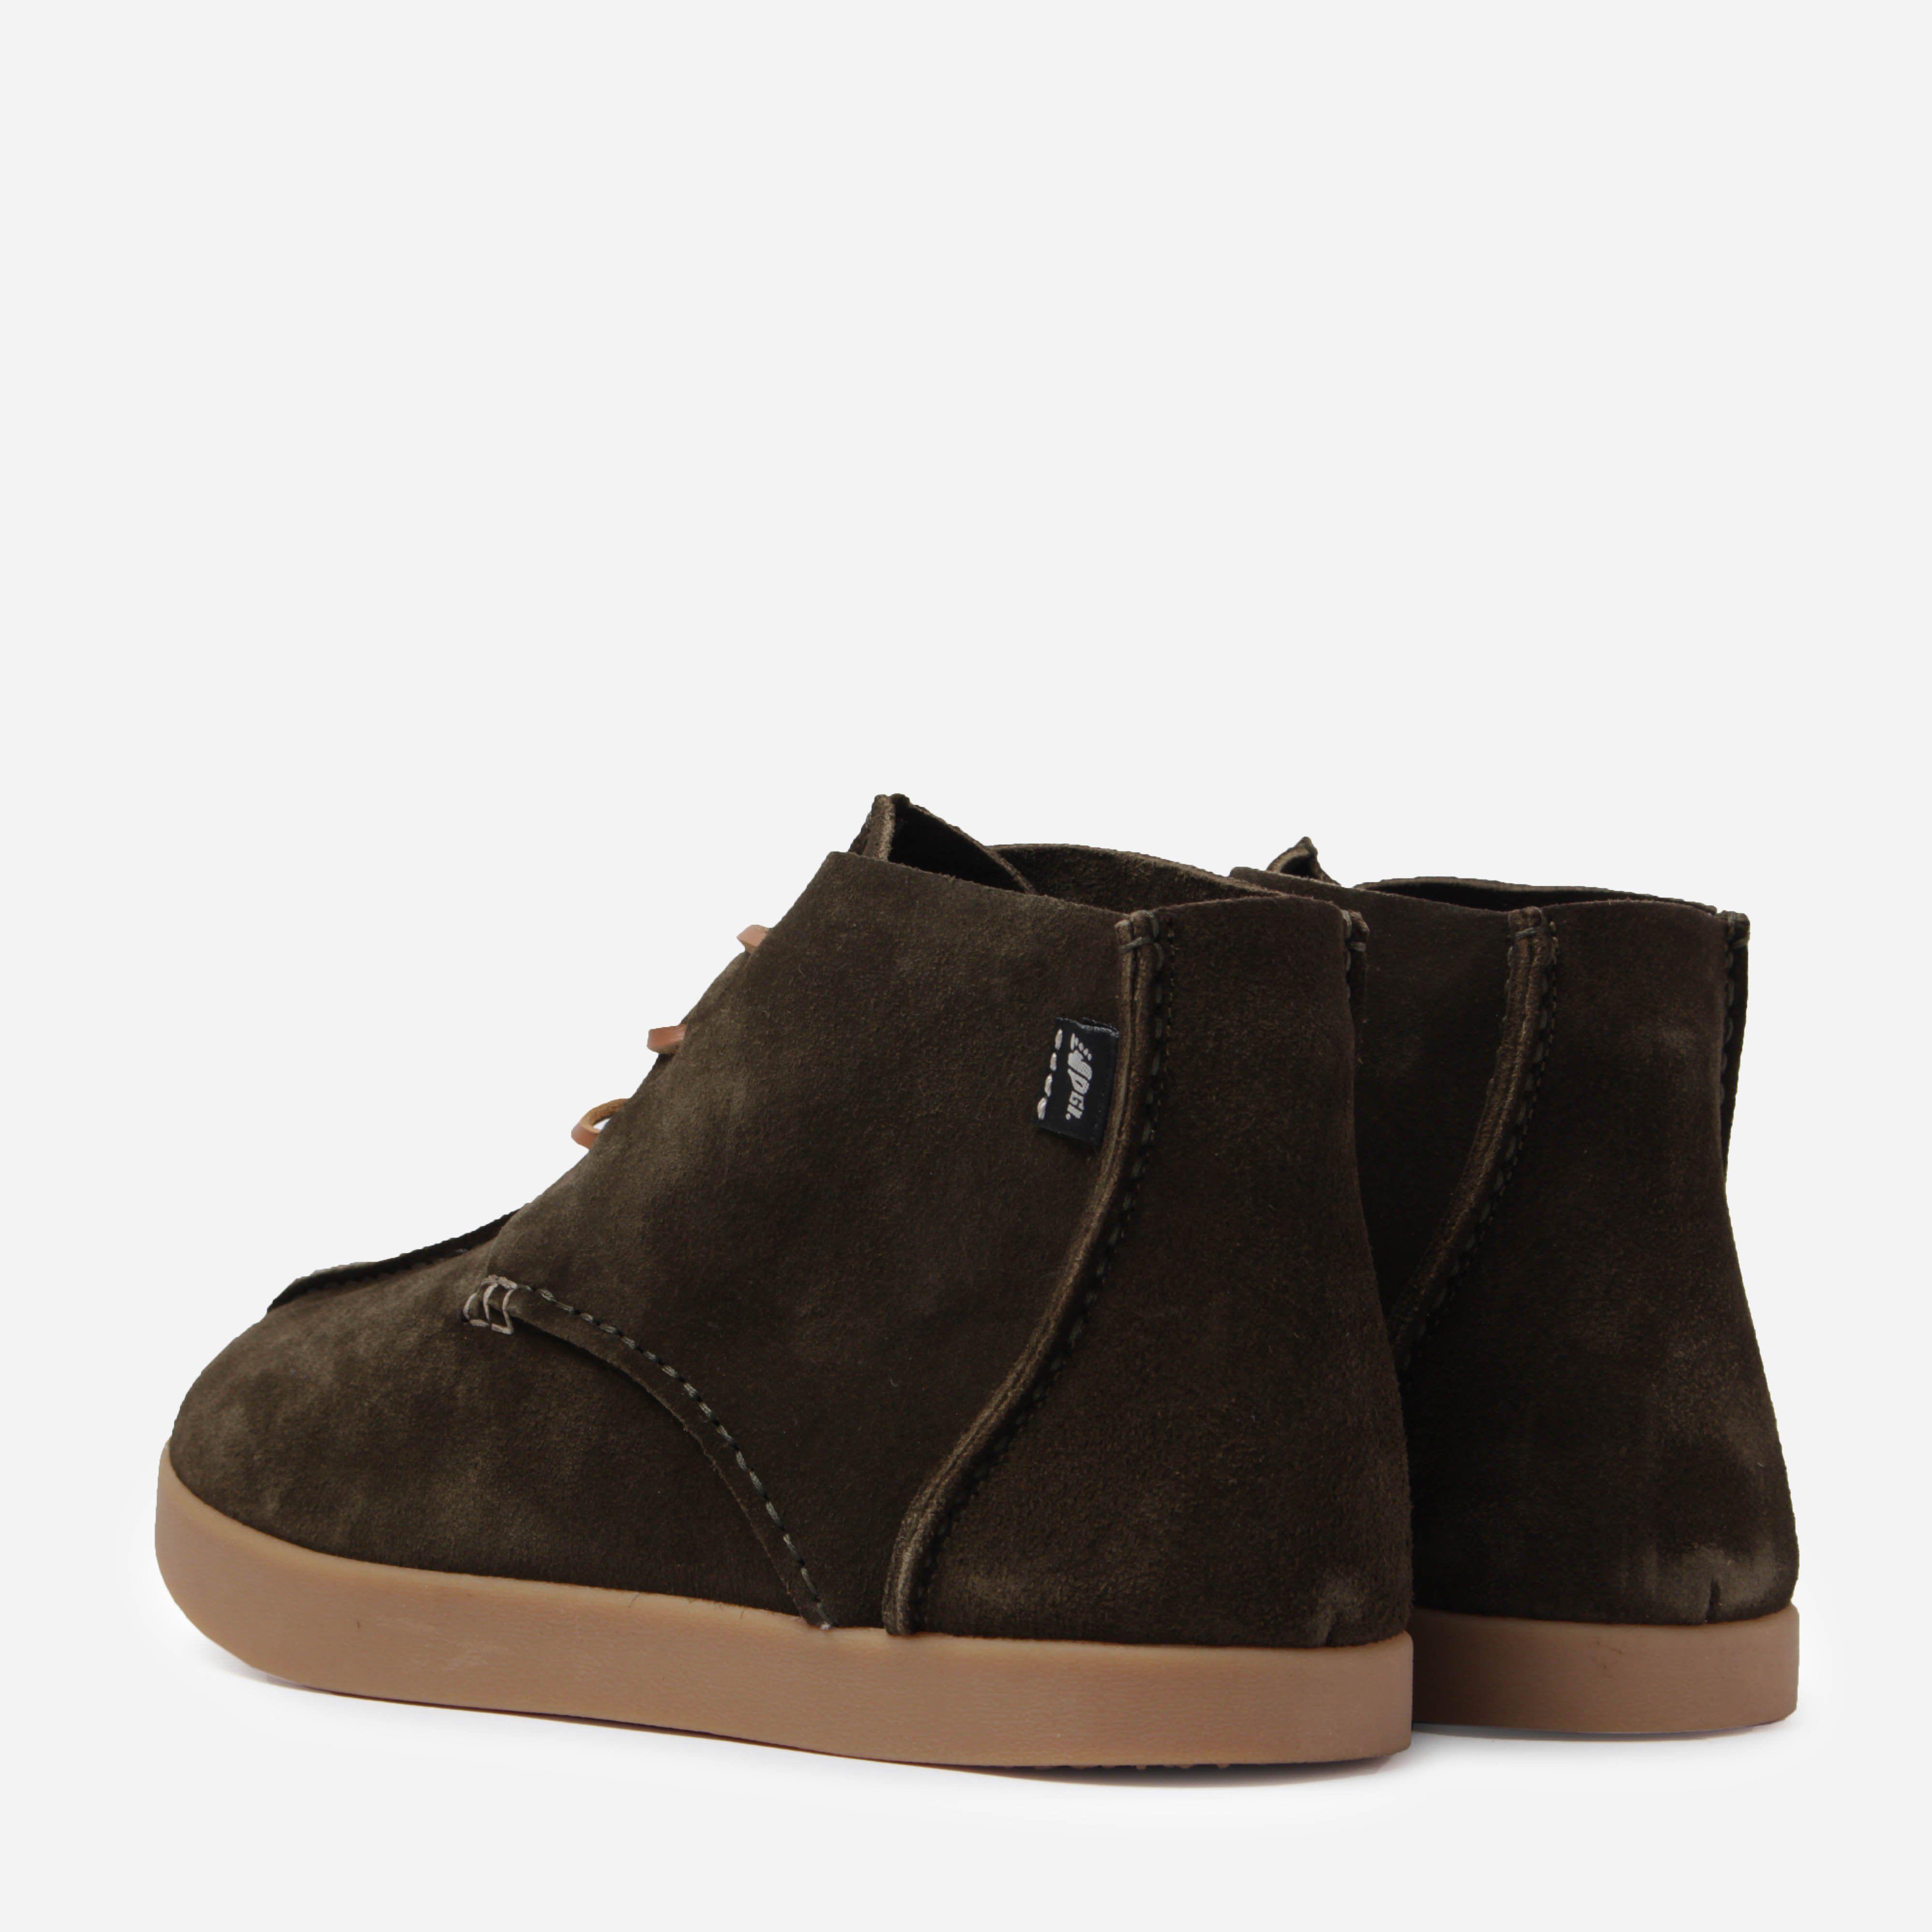 Yogi Footwear DYU14021 ELIJAH NEGATIVE HEEL LACE UP BOOT